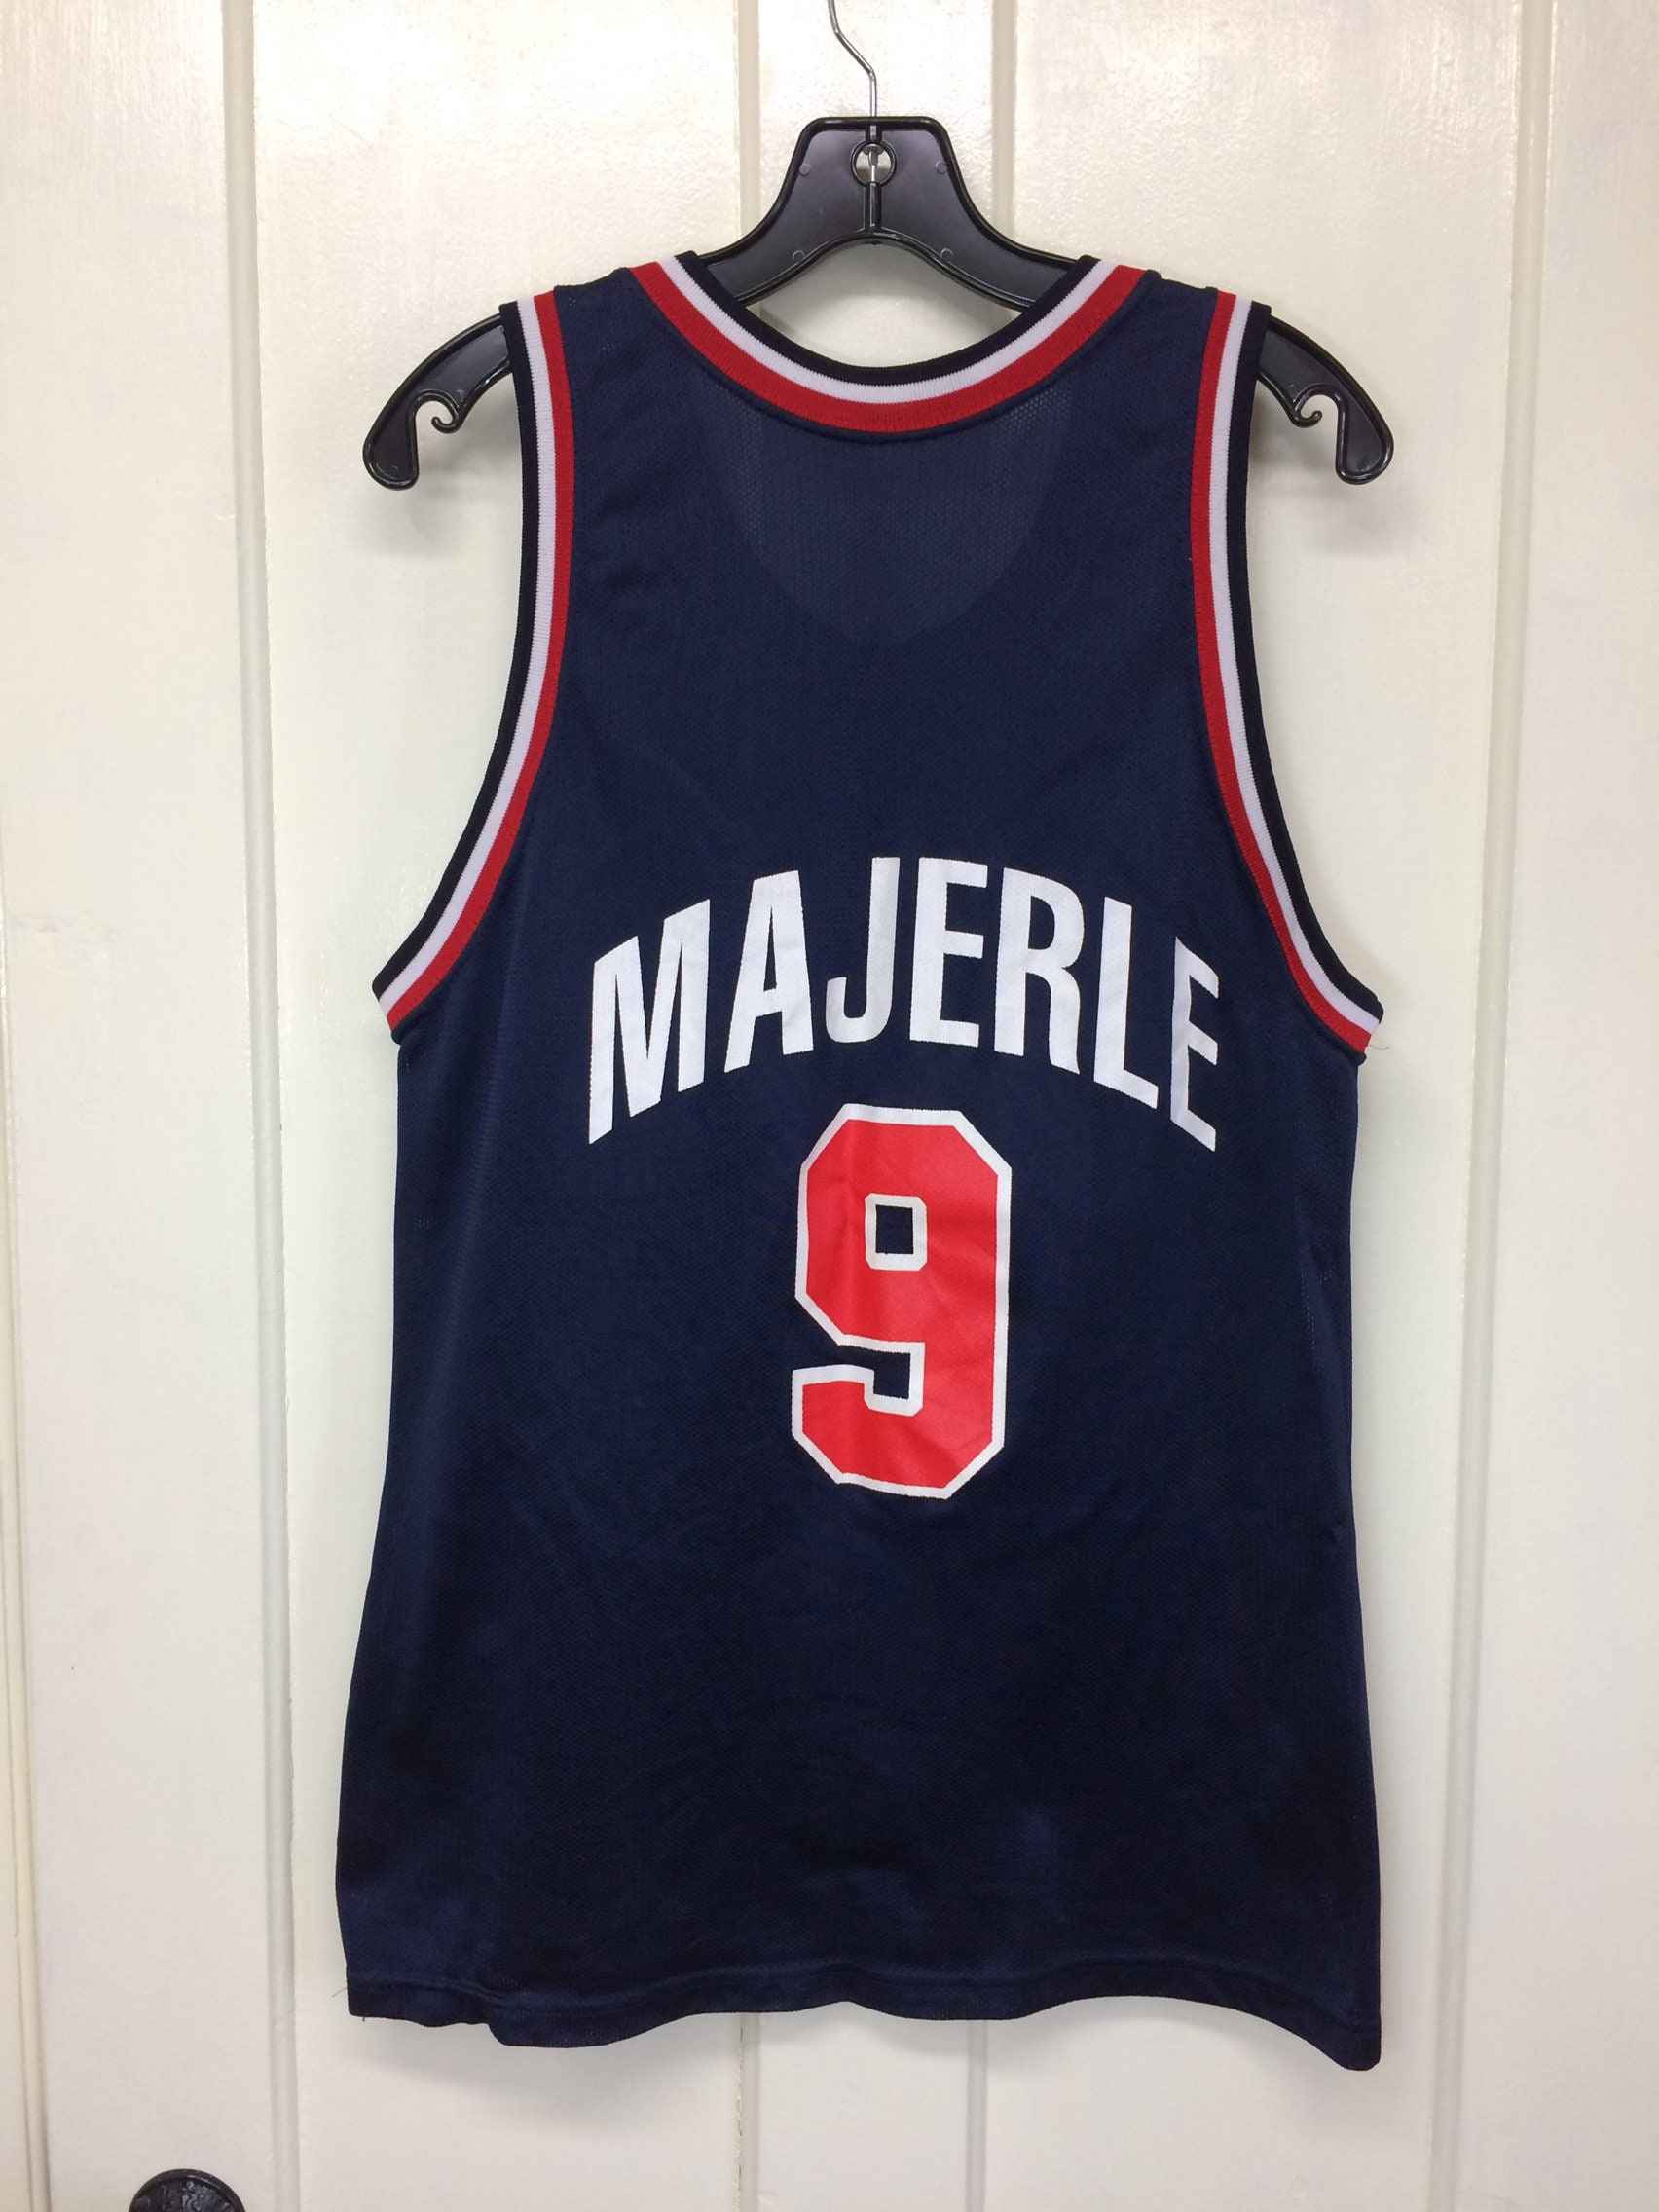 detailing 434af 51ccc 1990s USA Olympics basketball team Dan Majerle number 9 ...